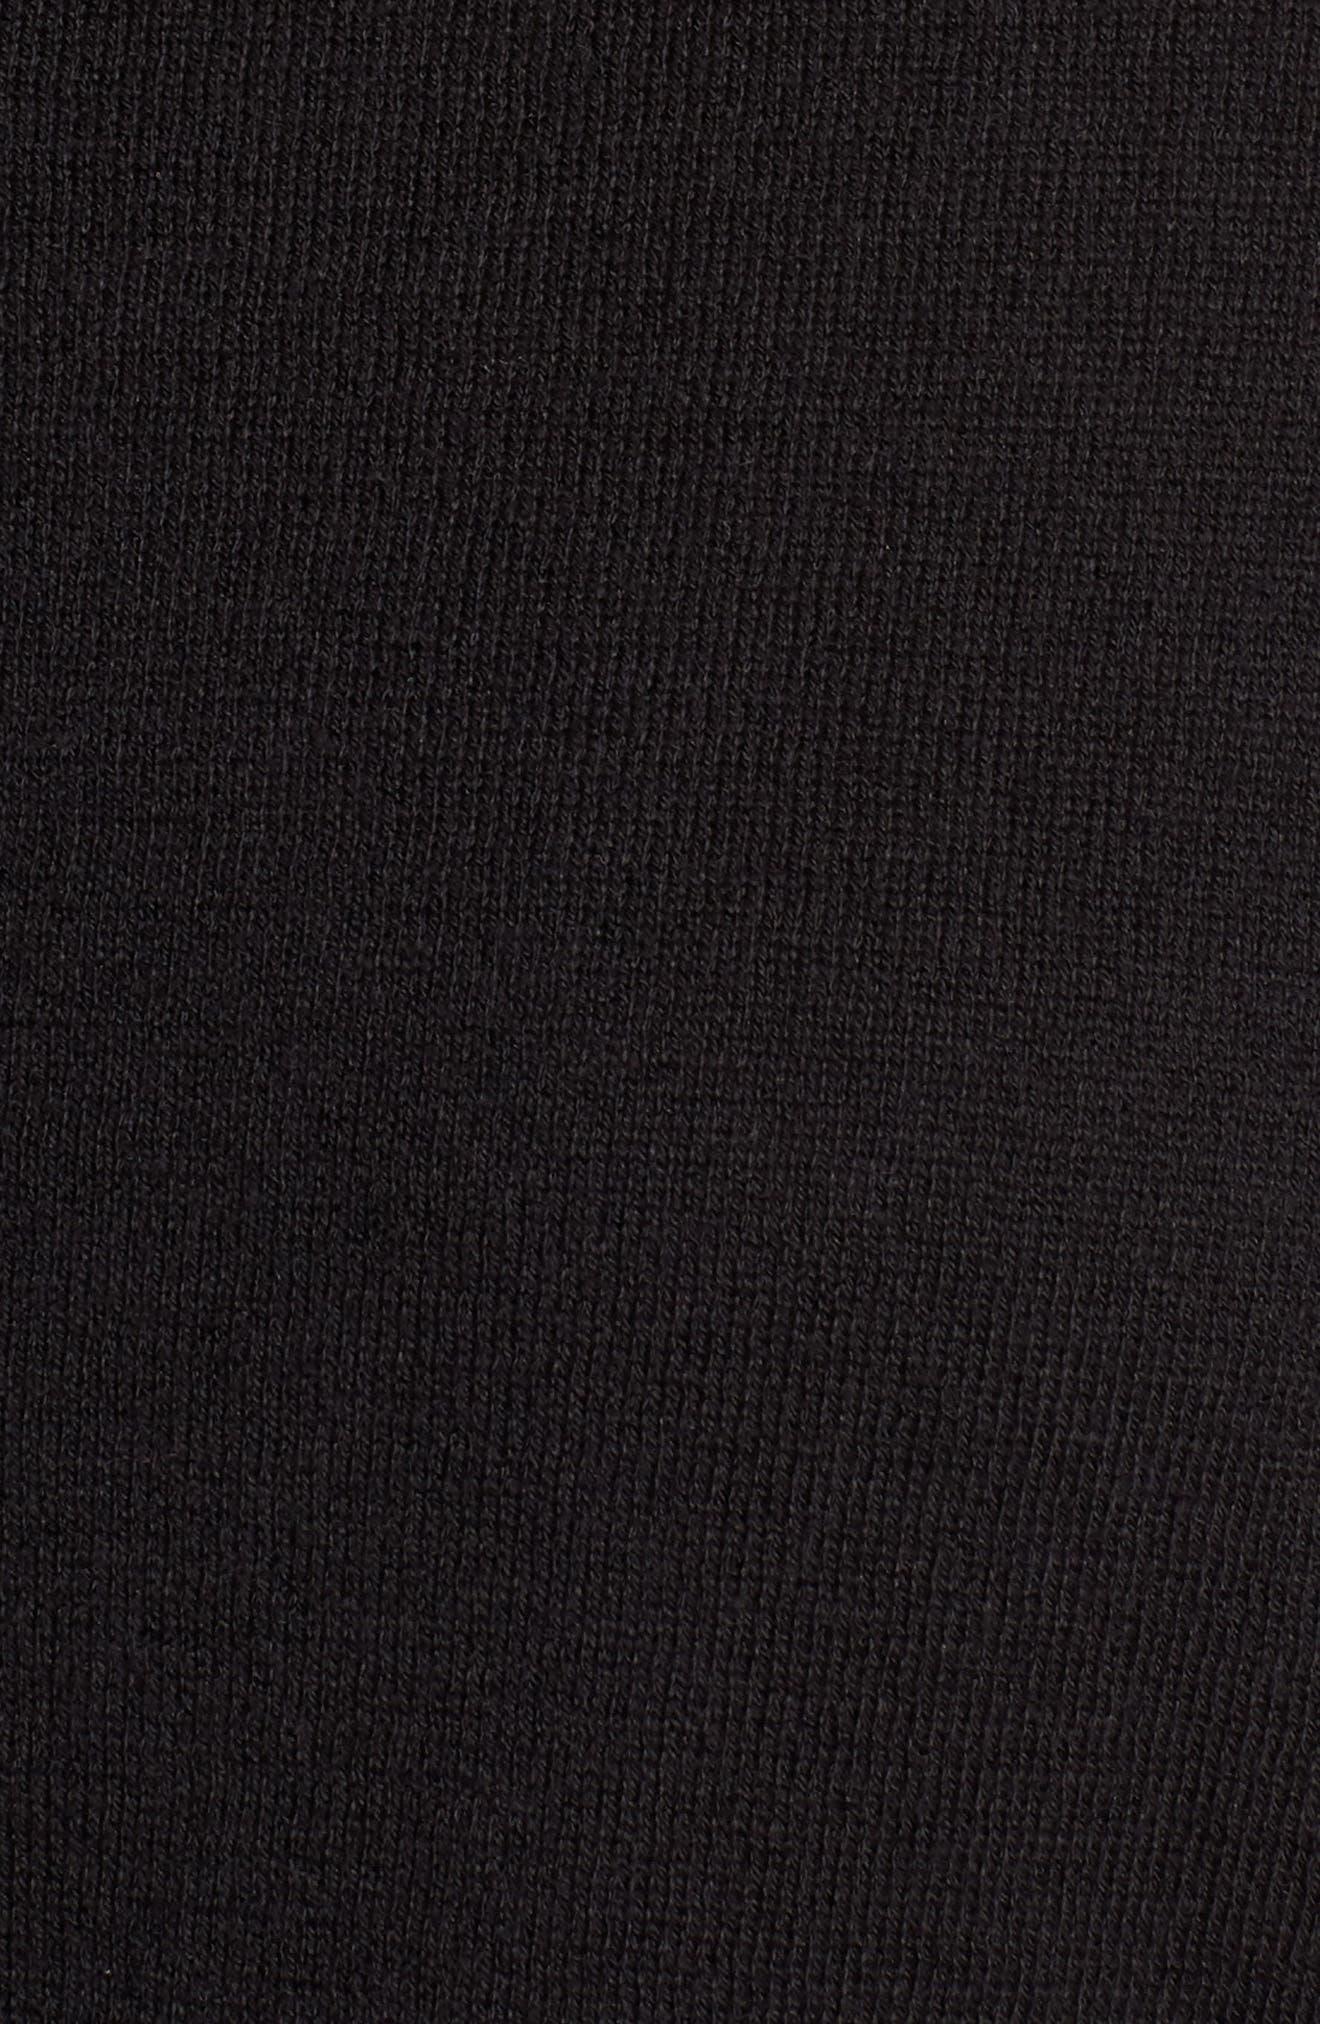 Cotton Blend Cardigan,                             Alternate thumbnail 6, color,                             BLACK